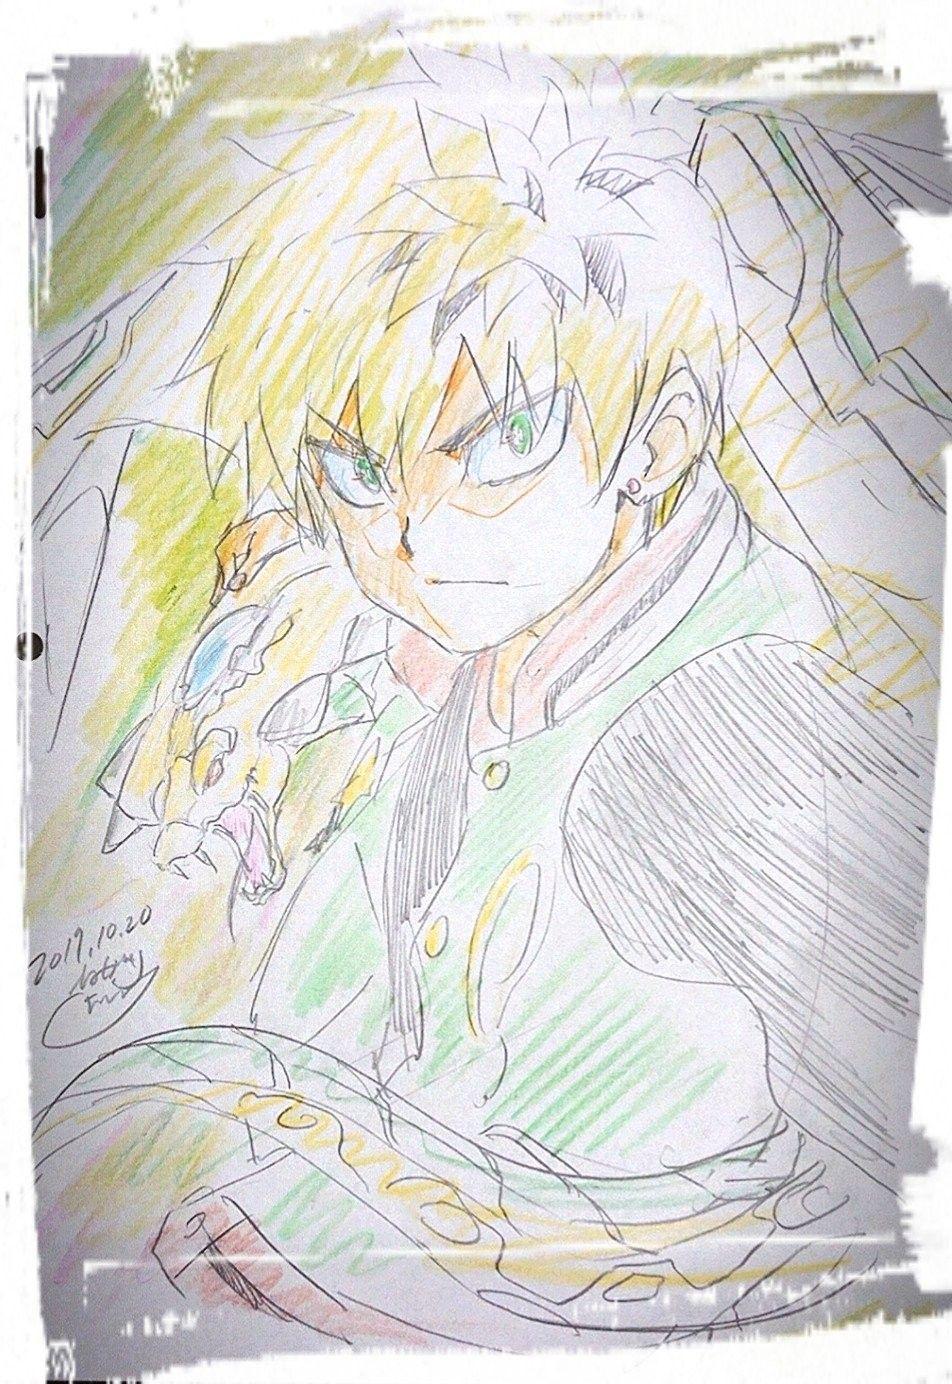 October 20th (10/20) is Quon's birthday date.Happy birthday,Quon Kimidori!!!🎁🎈🎉